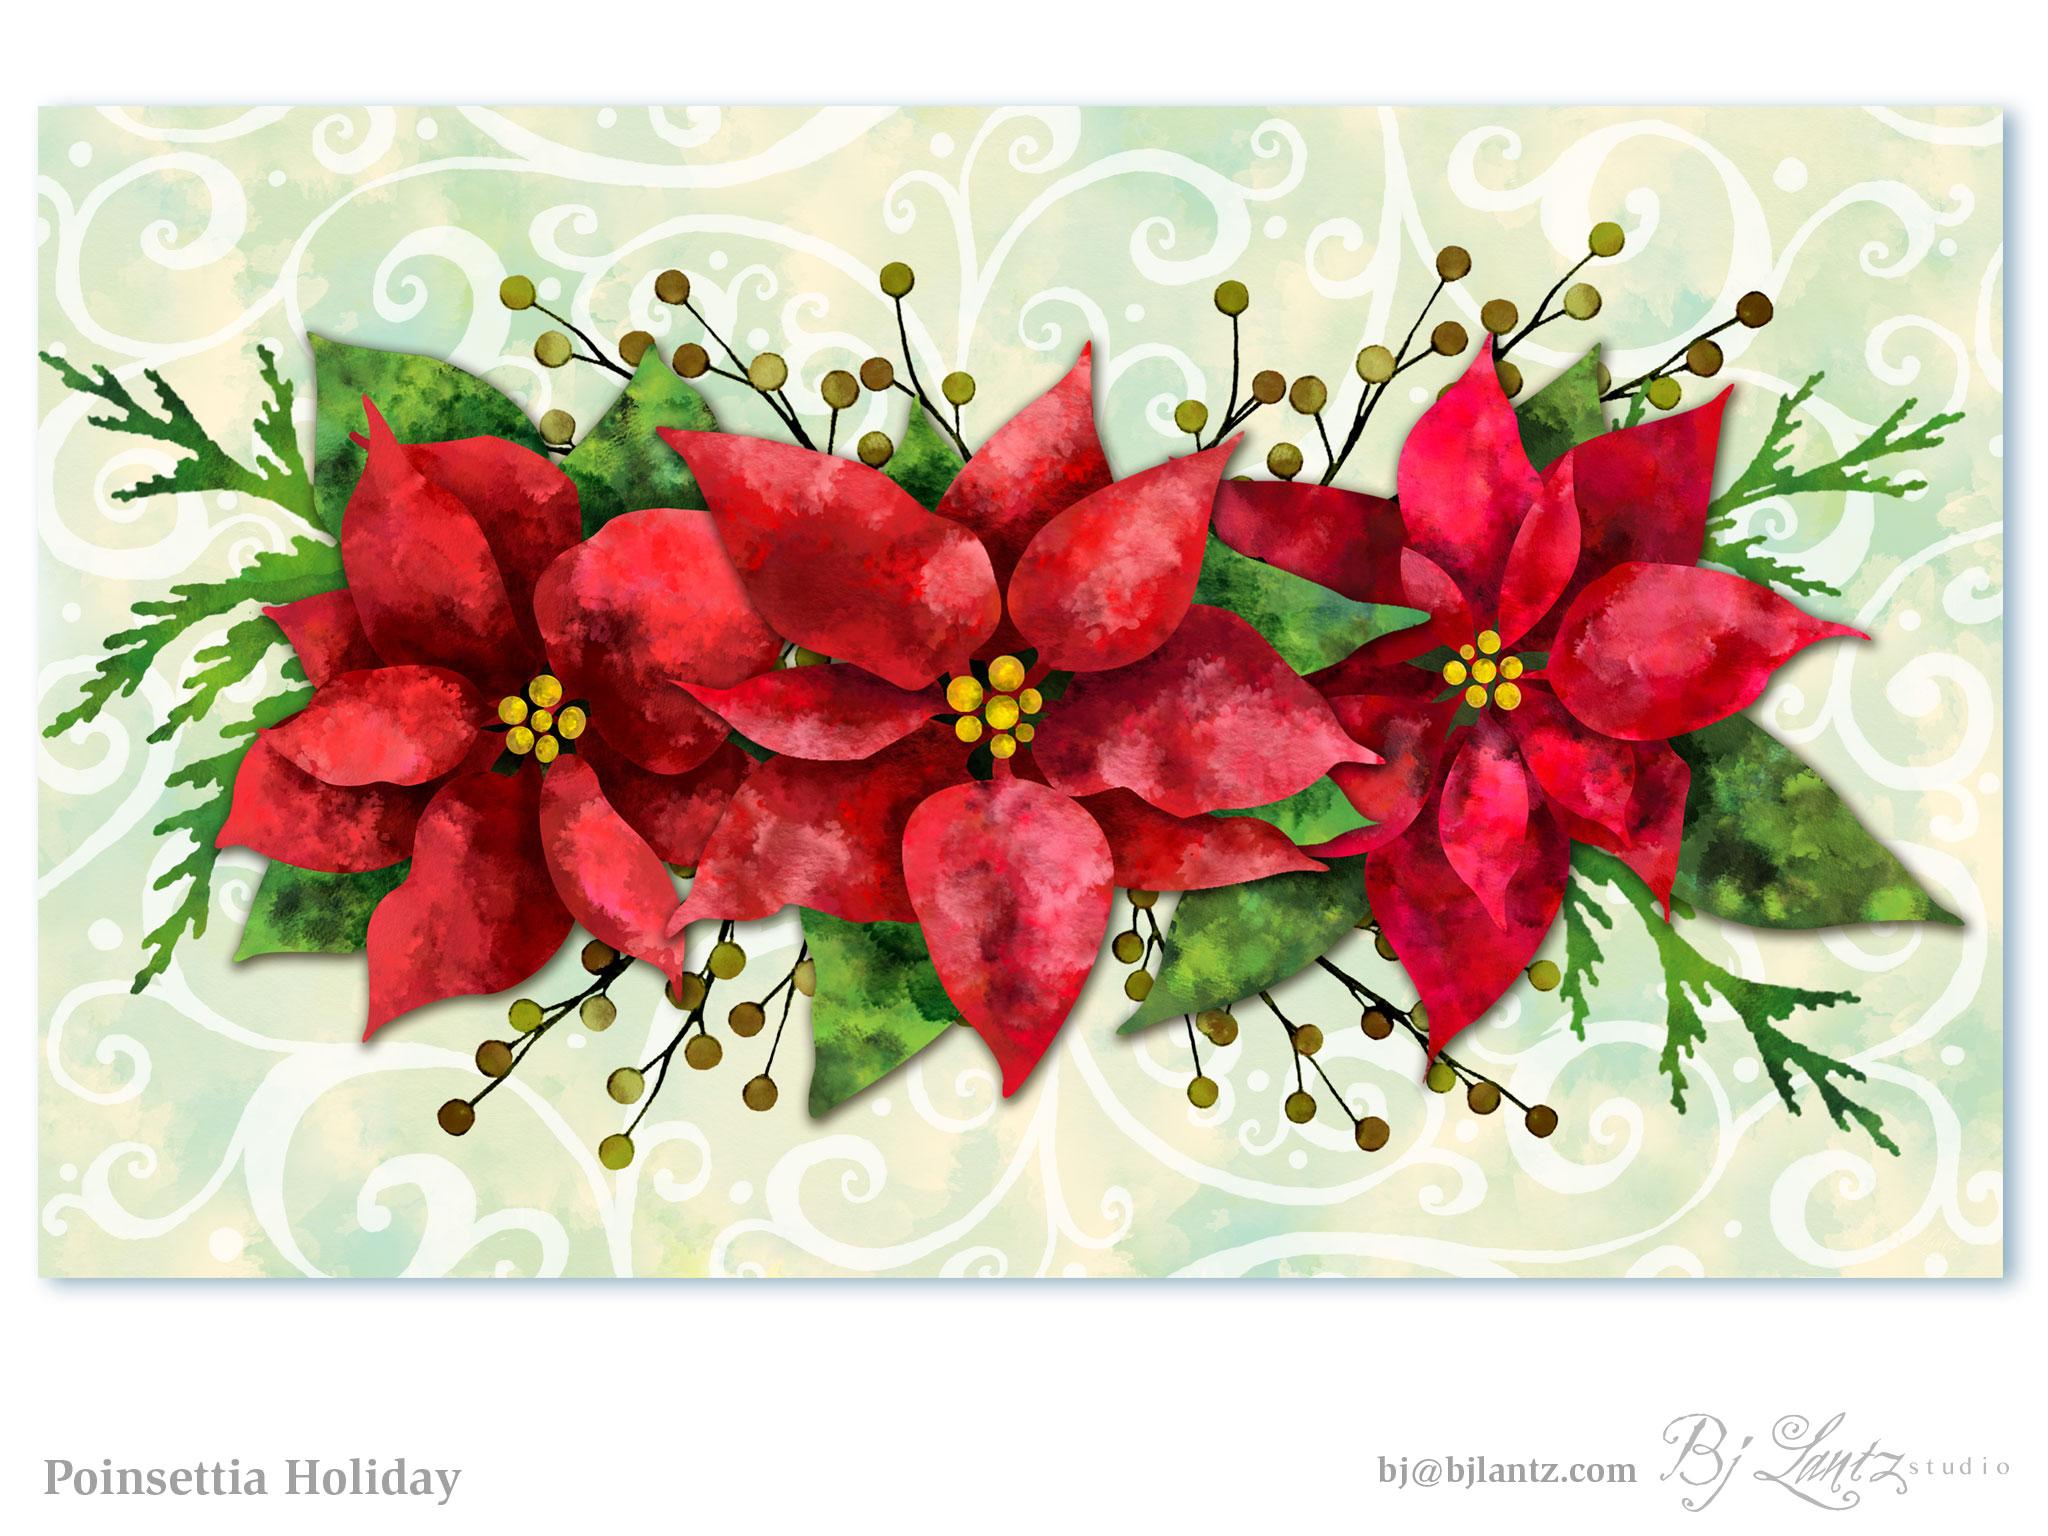 PoinsettiaHoliday_portfolio_3.jpg